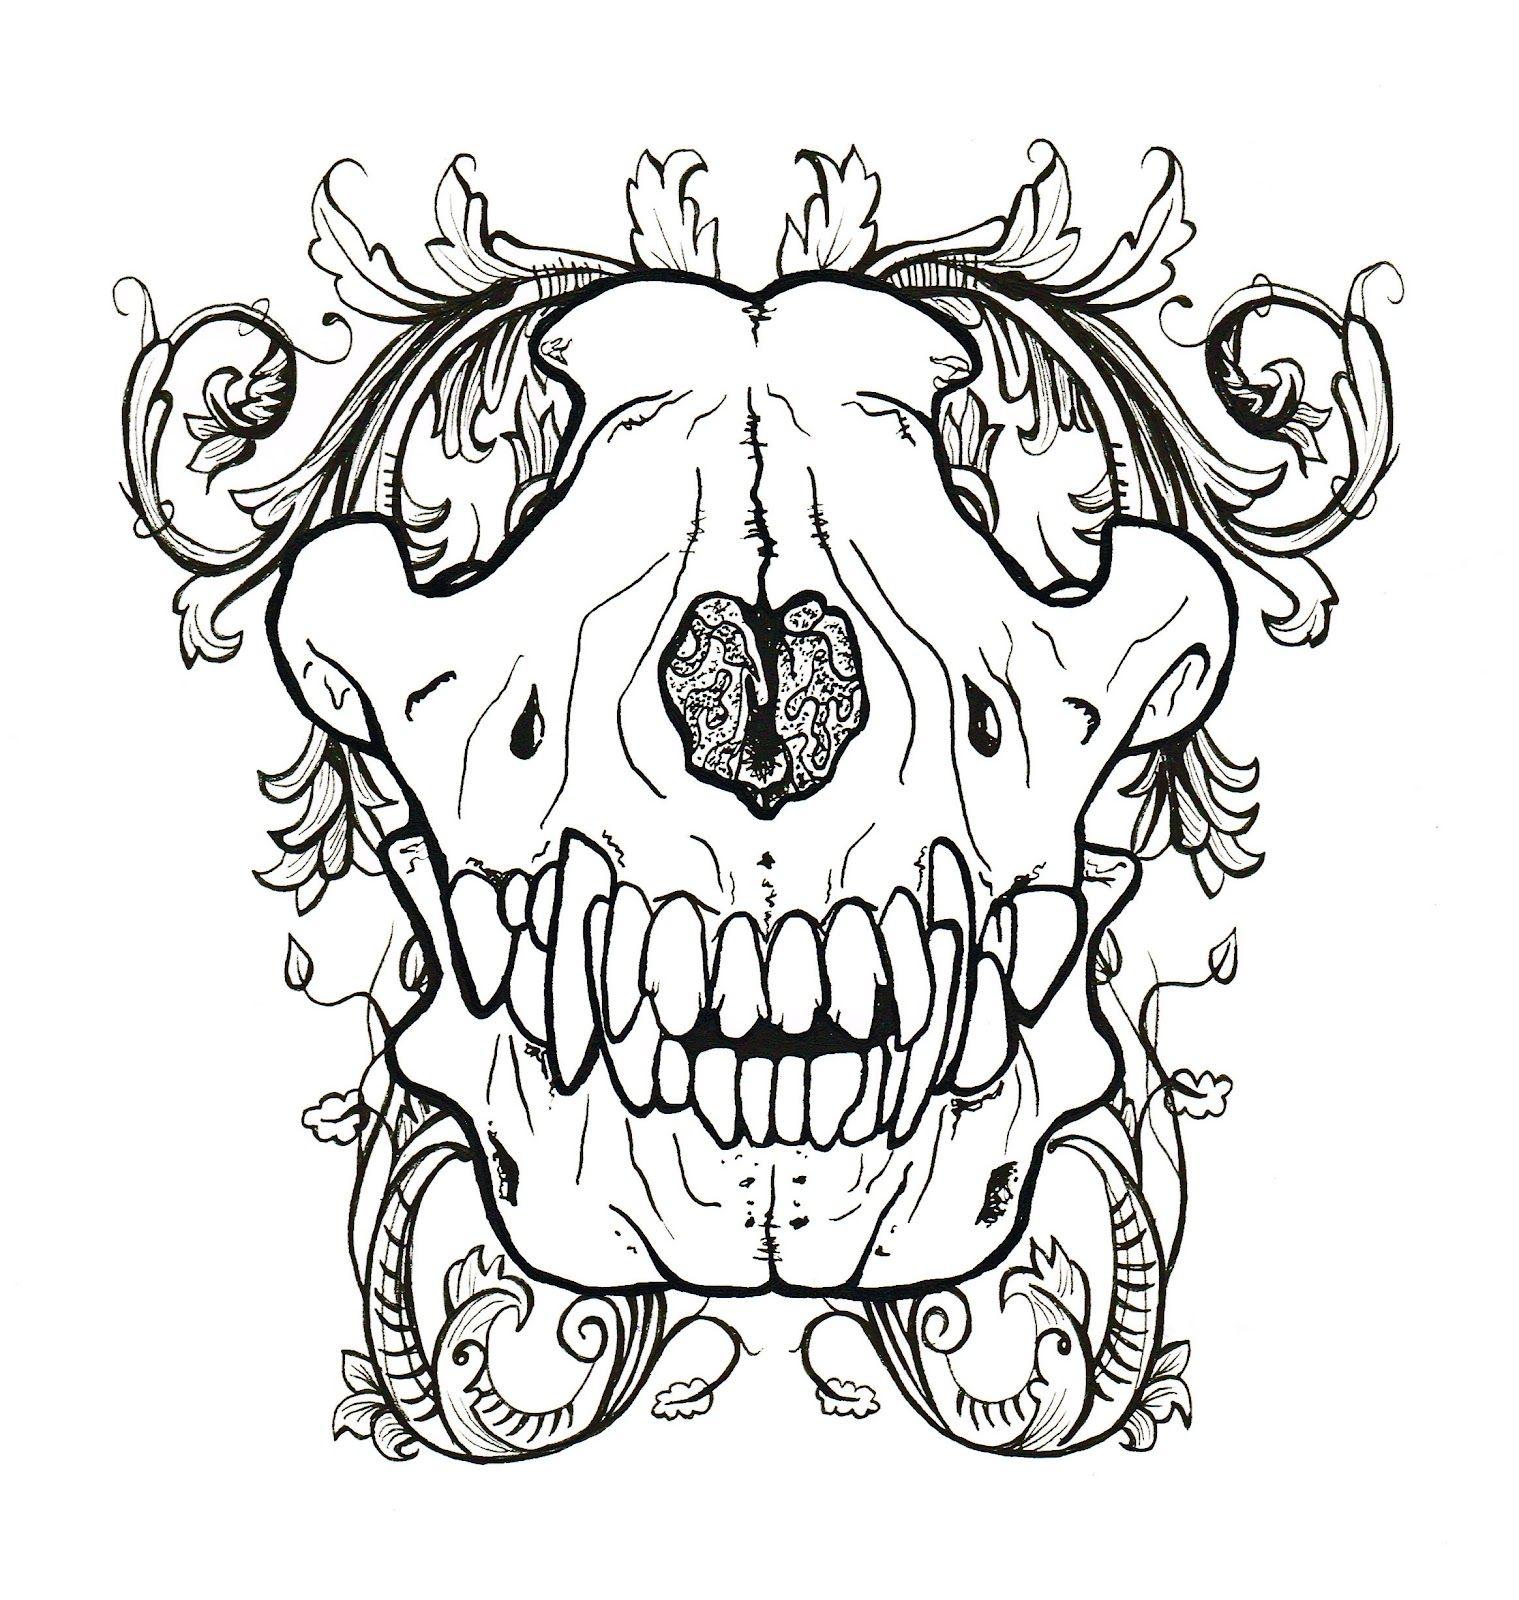 wolfskull.jpg (1519×1600)